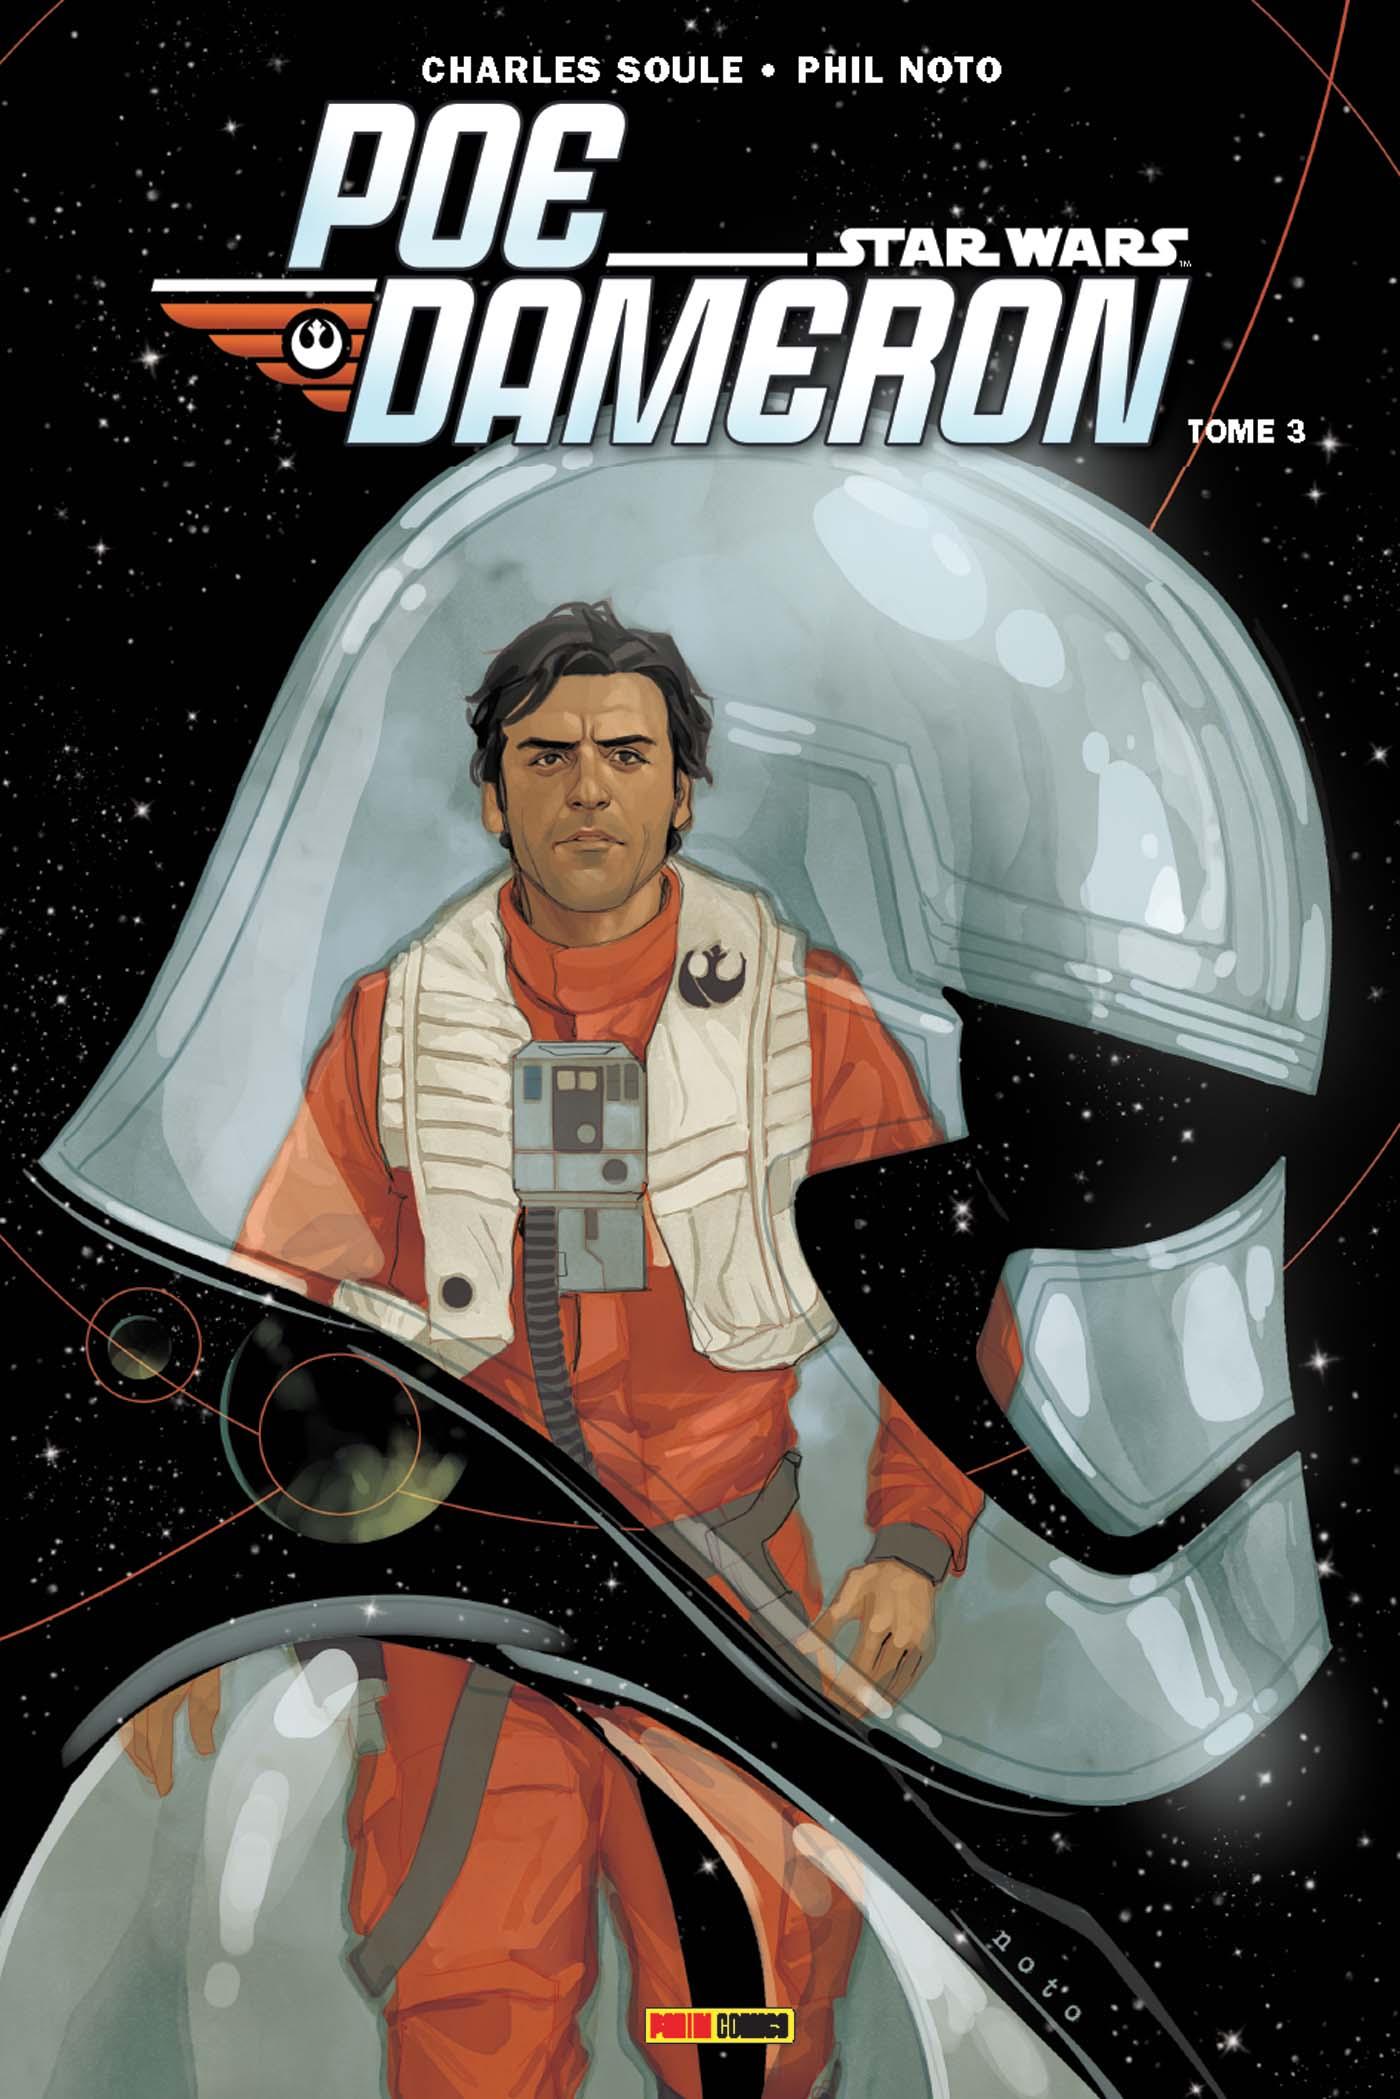 100% Star Wars - Poe Dameron T3 La <a href='/livre-492-tempete.html' class='qtip_motcle' tt_type='livre' tt_id=492>Tempête</a> Approche